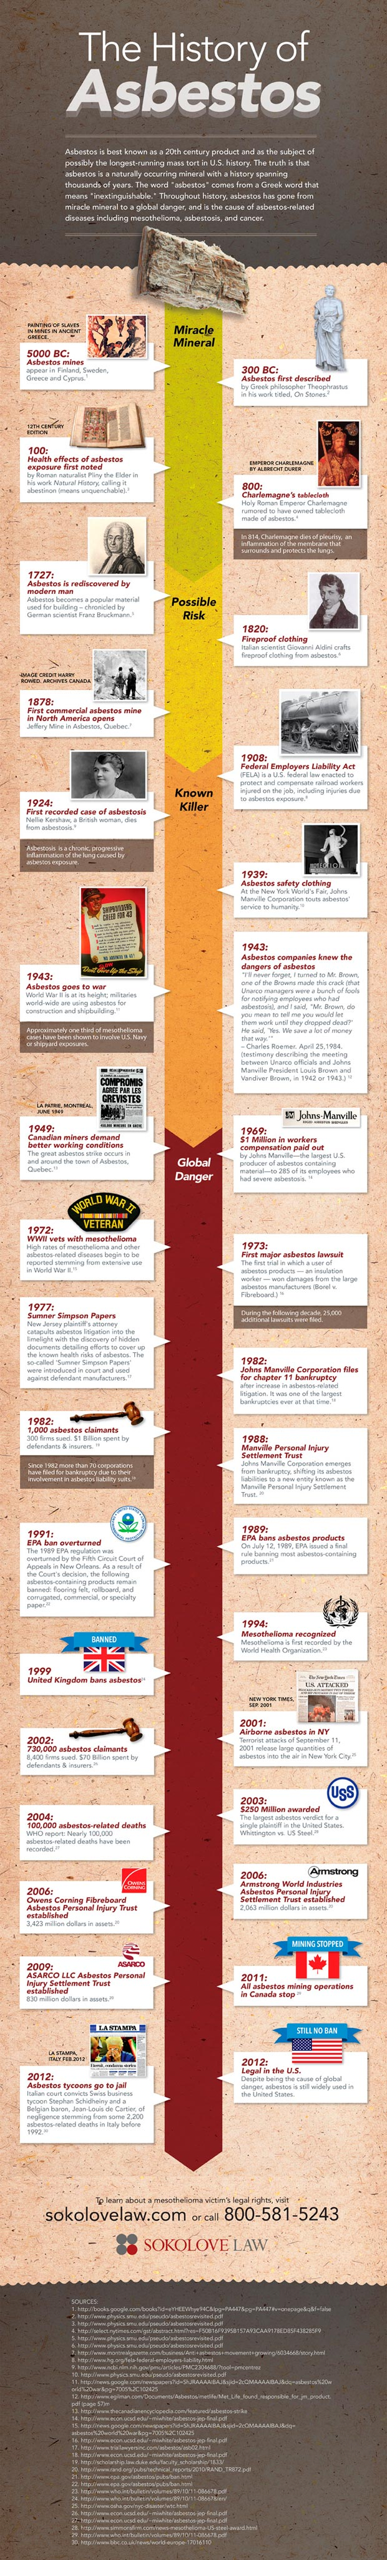 history-of-asbestos